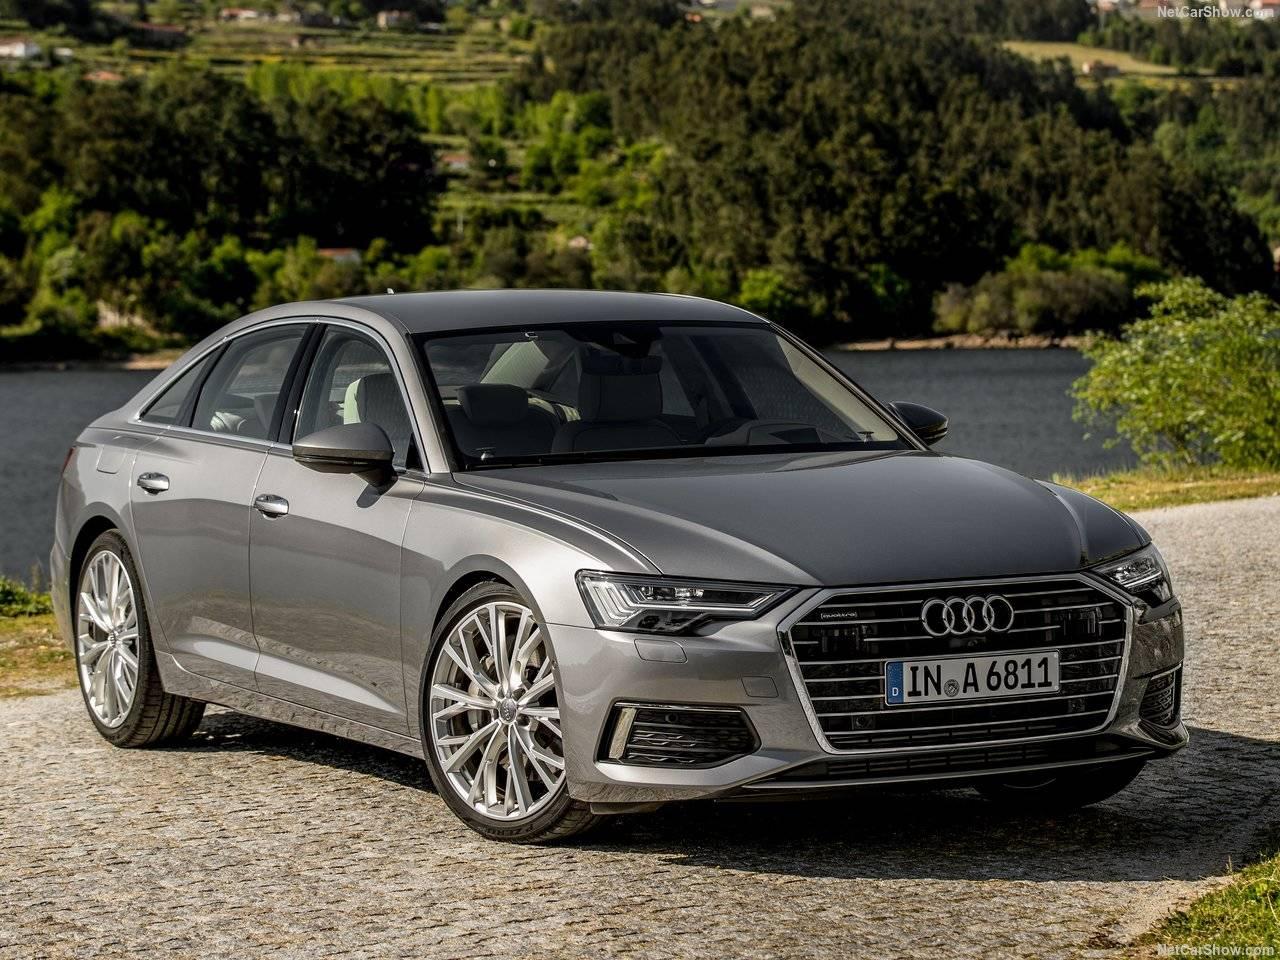 Audi A6が2019年バージョンを発表か?!アウディの先進技術と灯火類のデザインが、特にポイント。